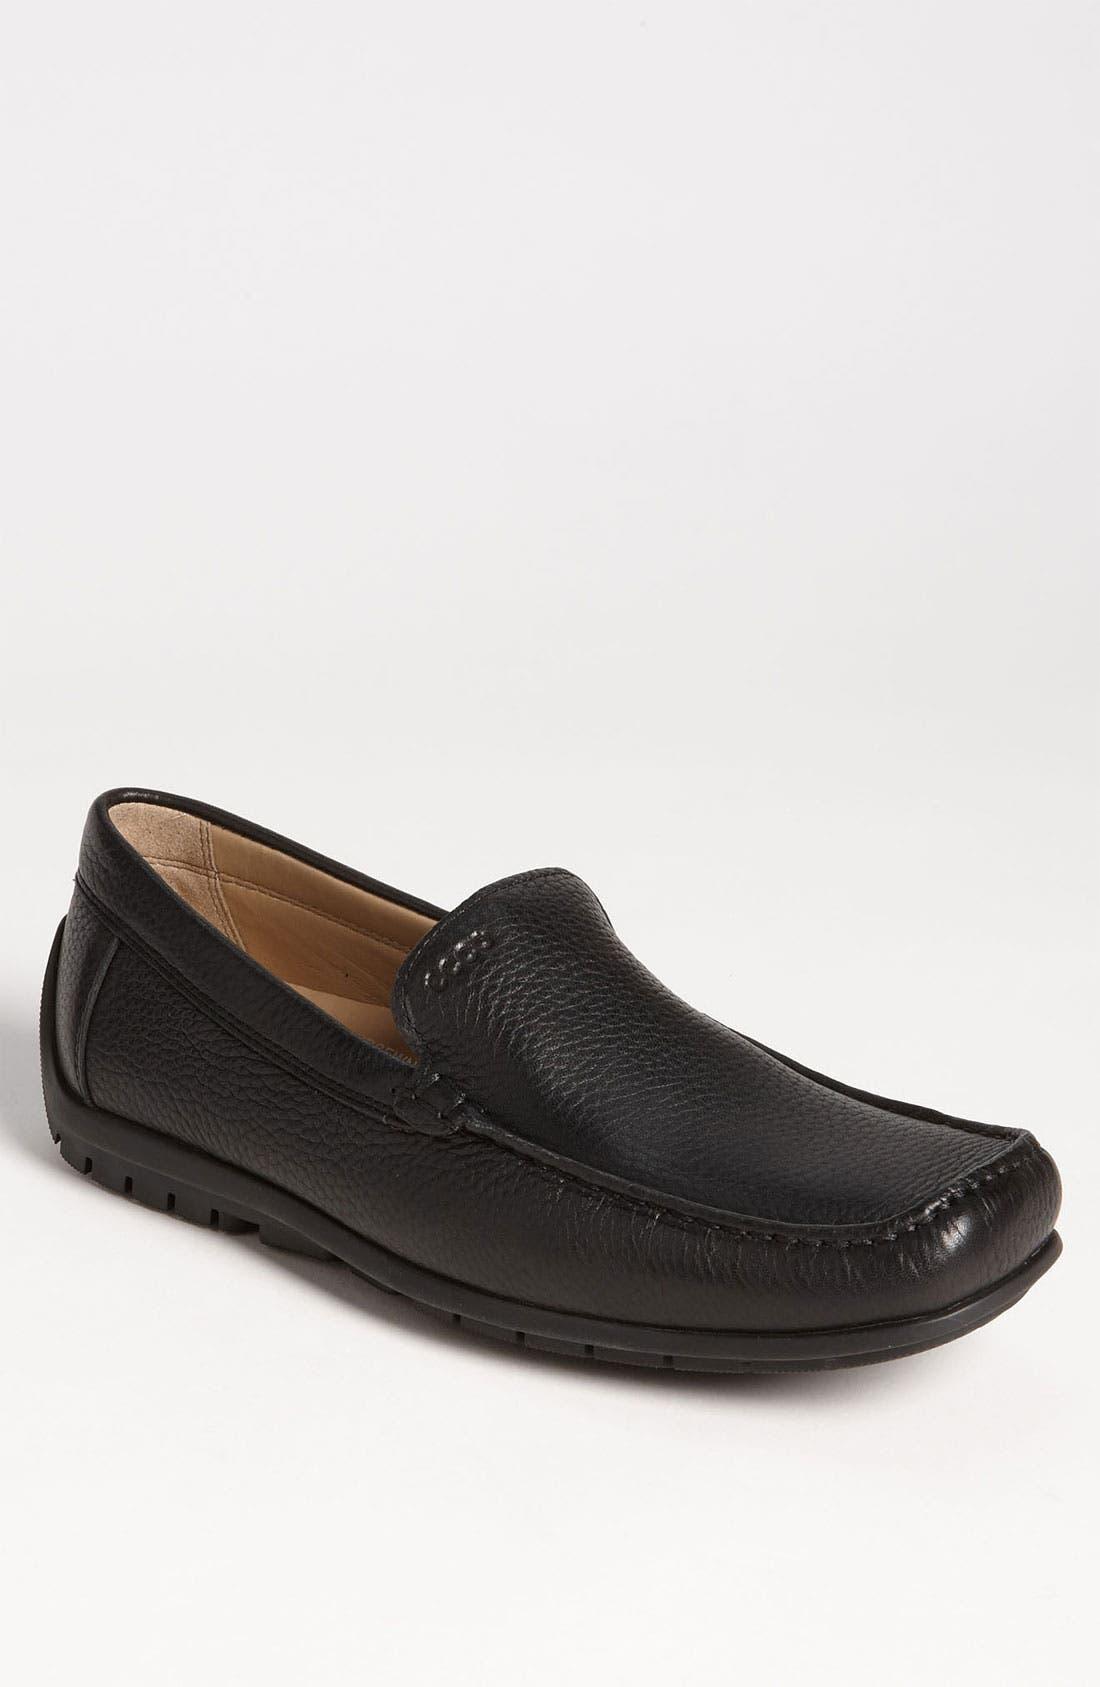 Alternate Image 1 Selected - ECCO 'Soft' Driving Shoe (Men)